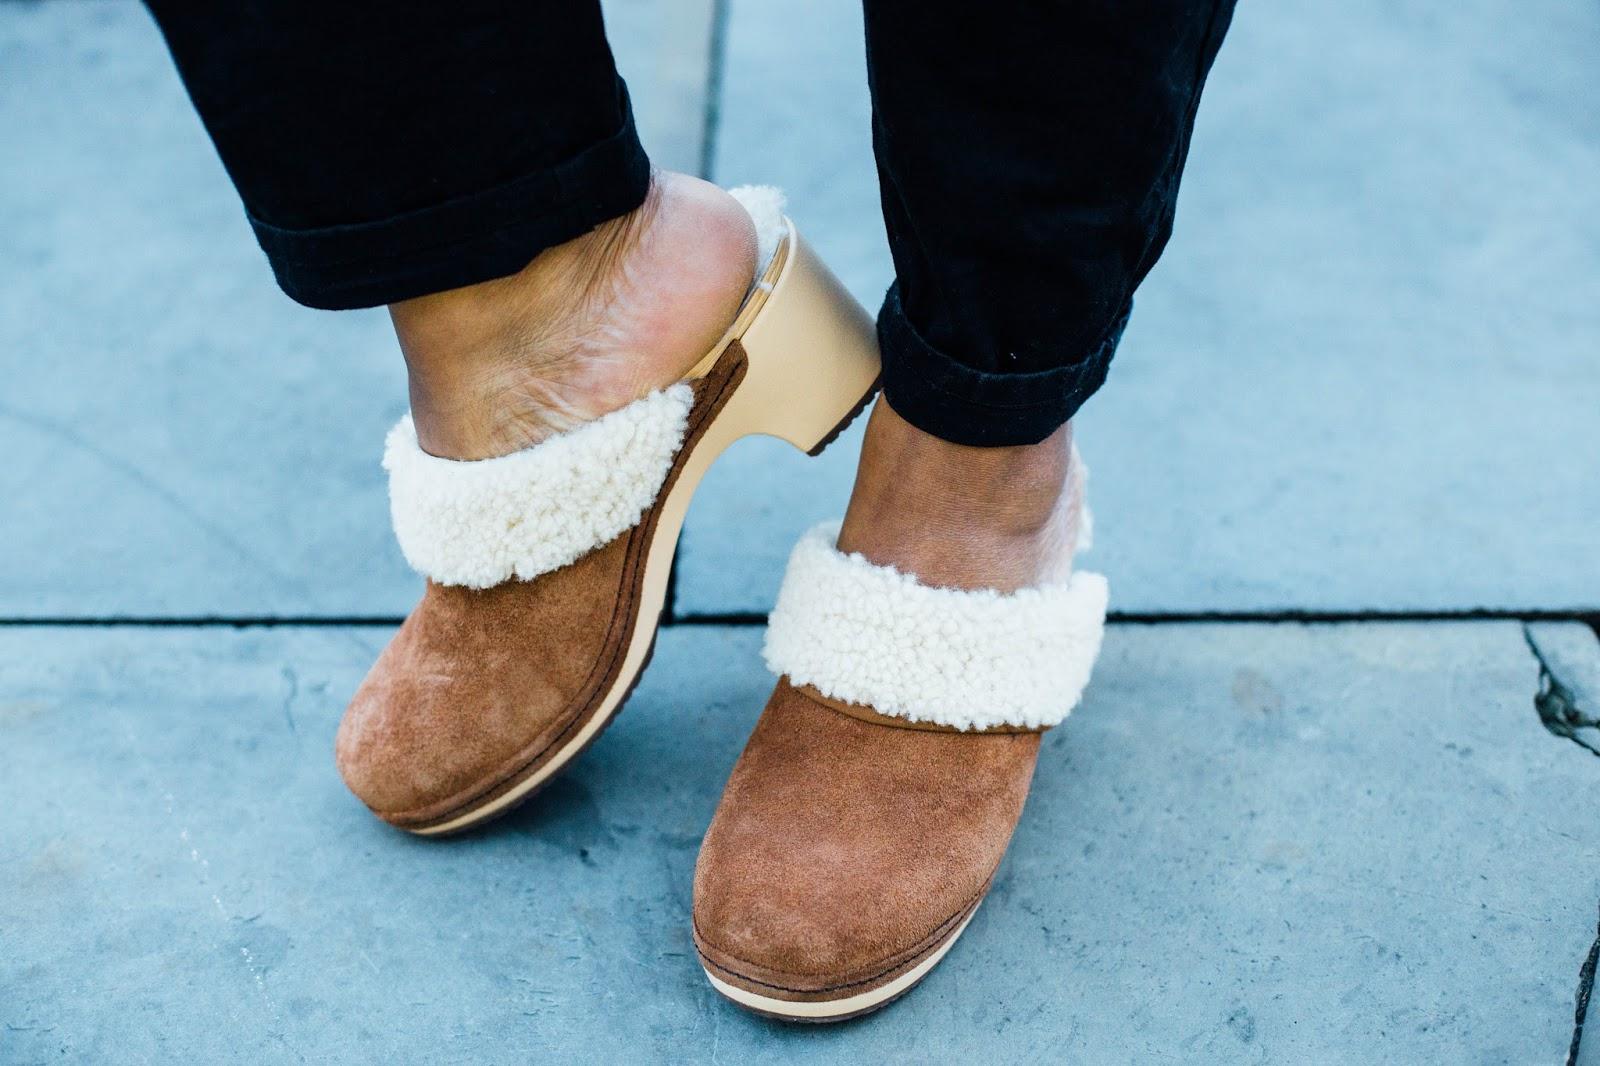 How To Wear The @Crocs_UK Clog #70sFashion @CrocsEU